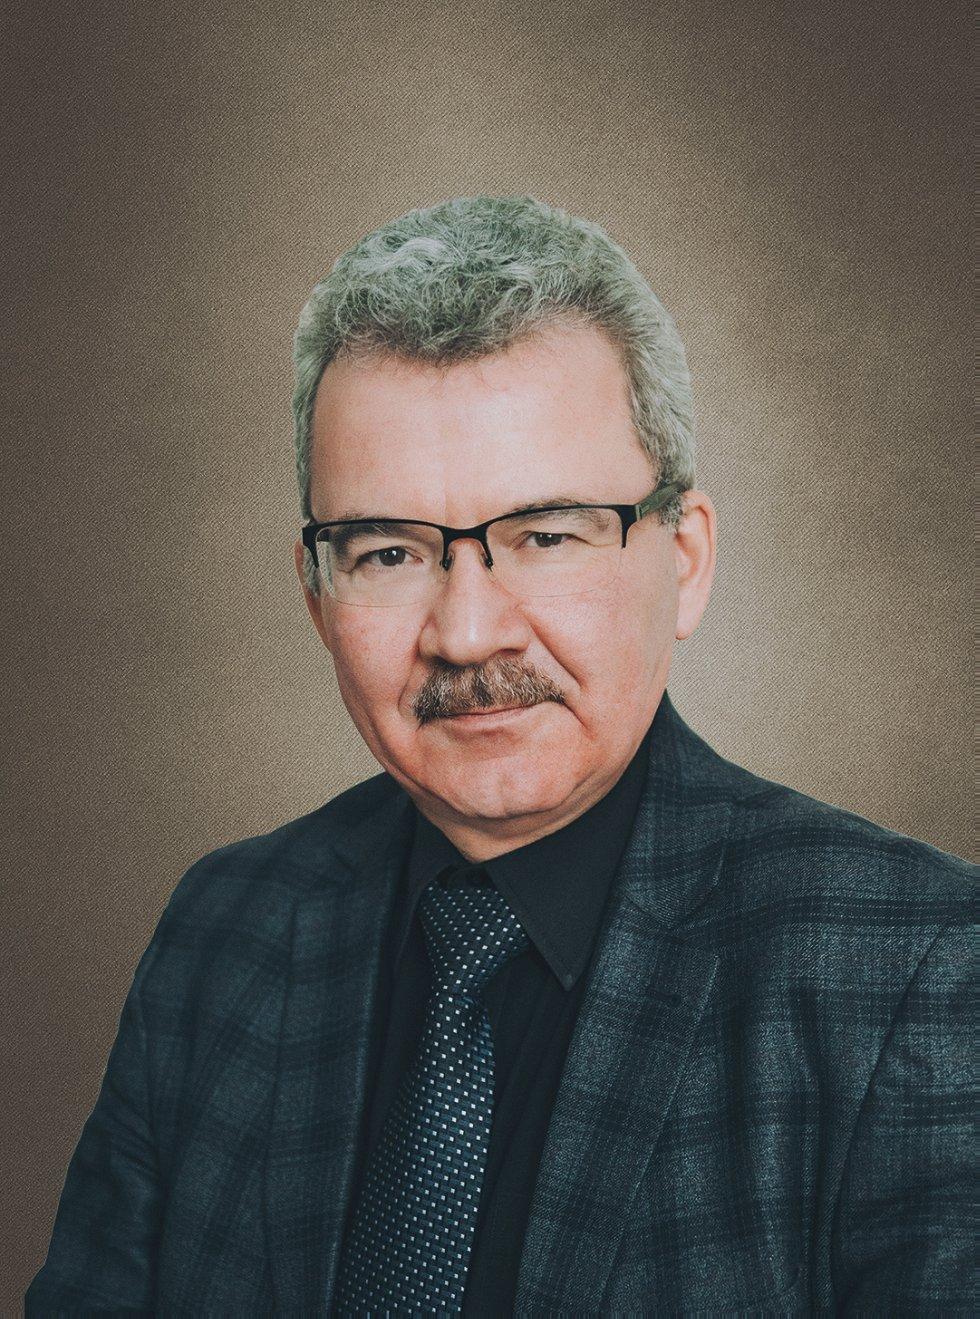 Фахрутдинов Раиль Равилович